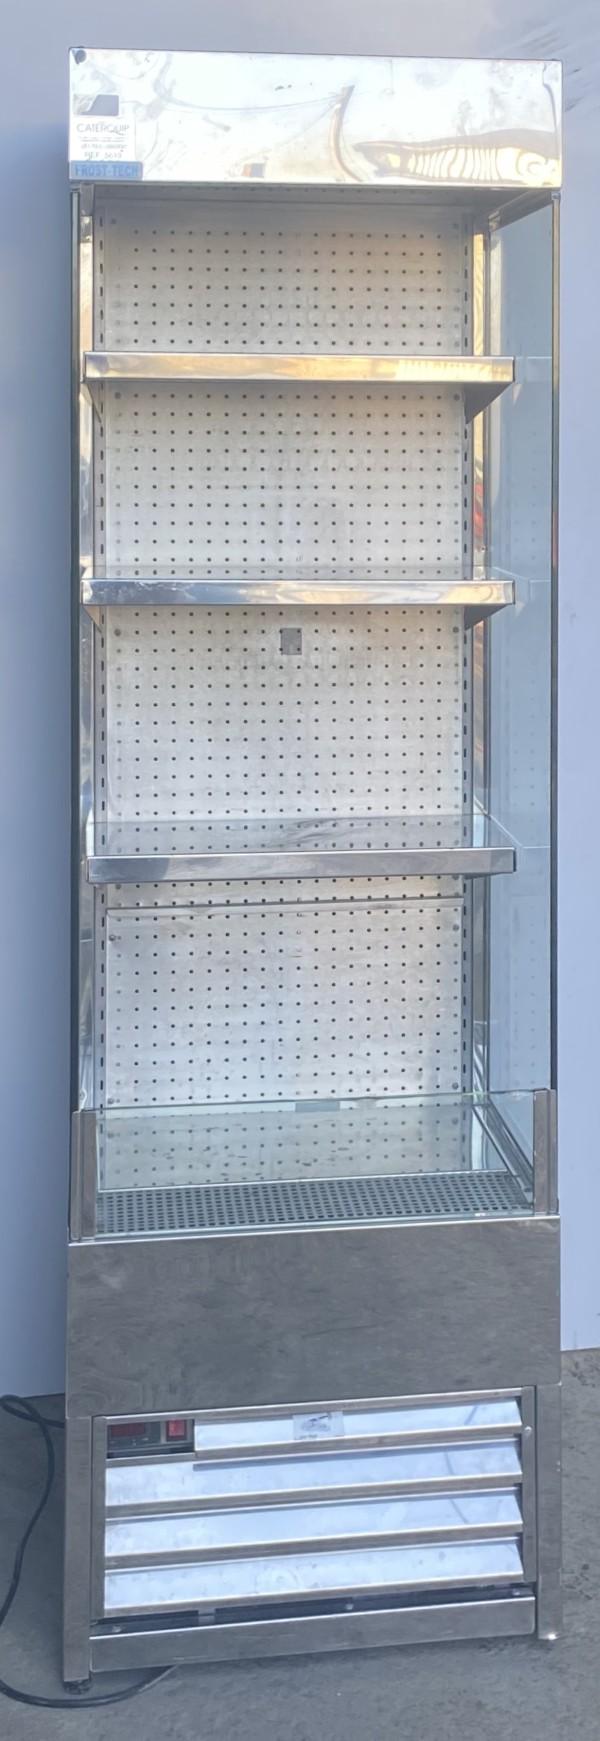 60cm Chilled Multi Deck